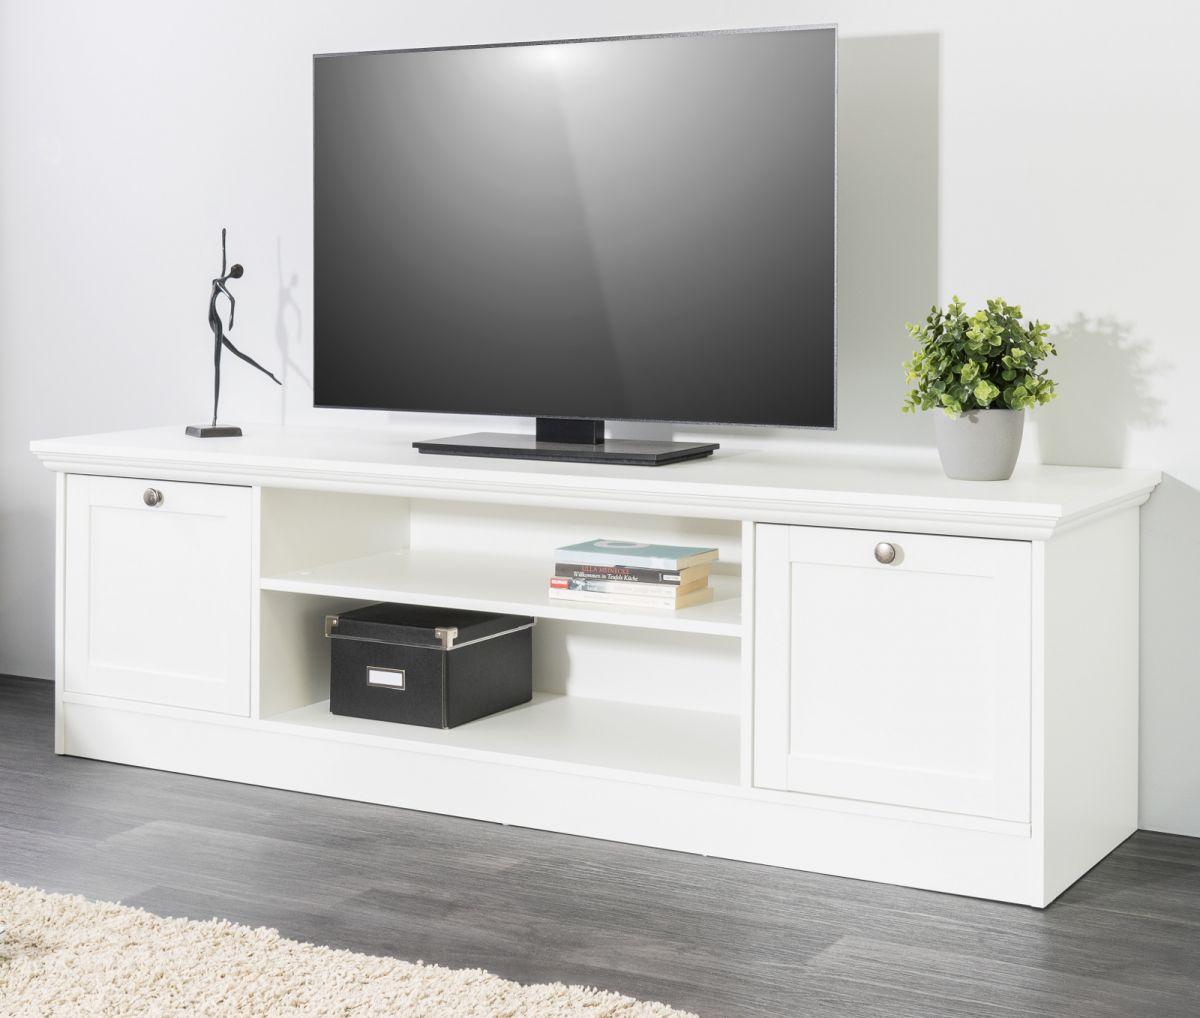 TV-Lowboard Landwood weiss 160 x 48 cm